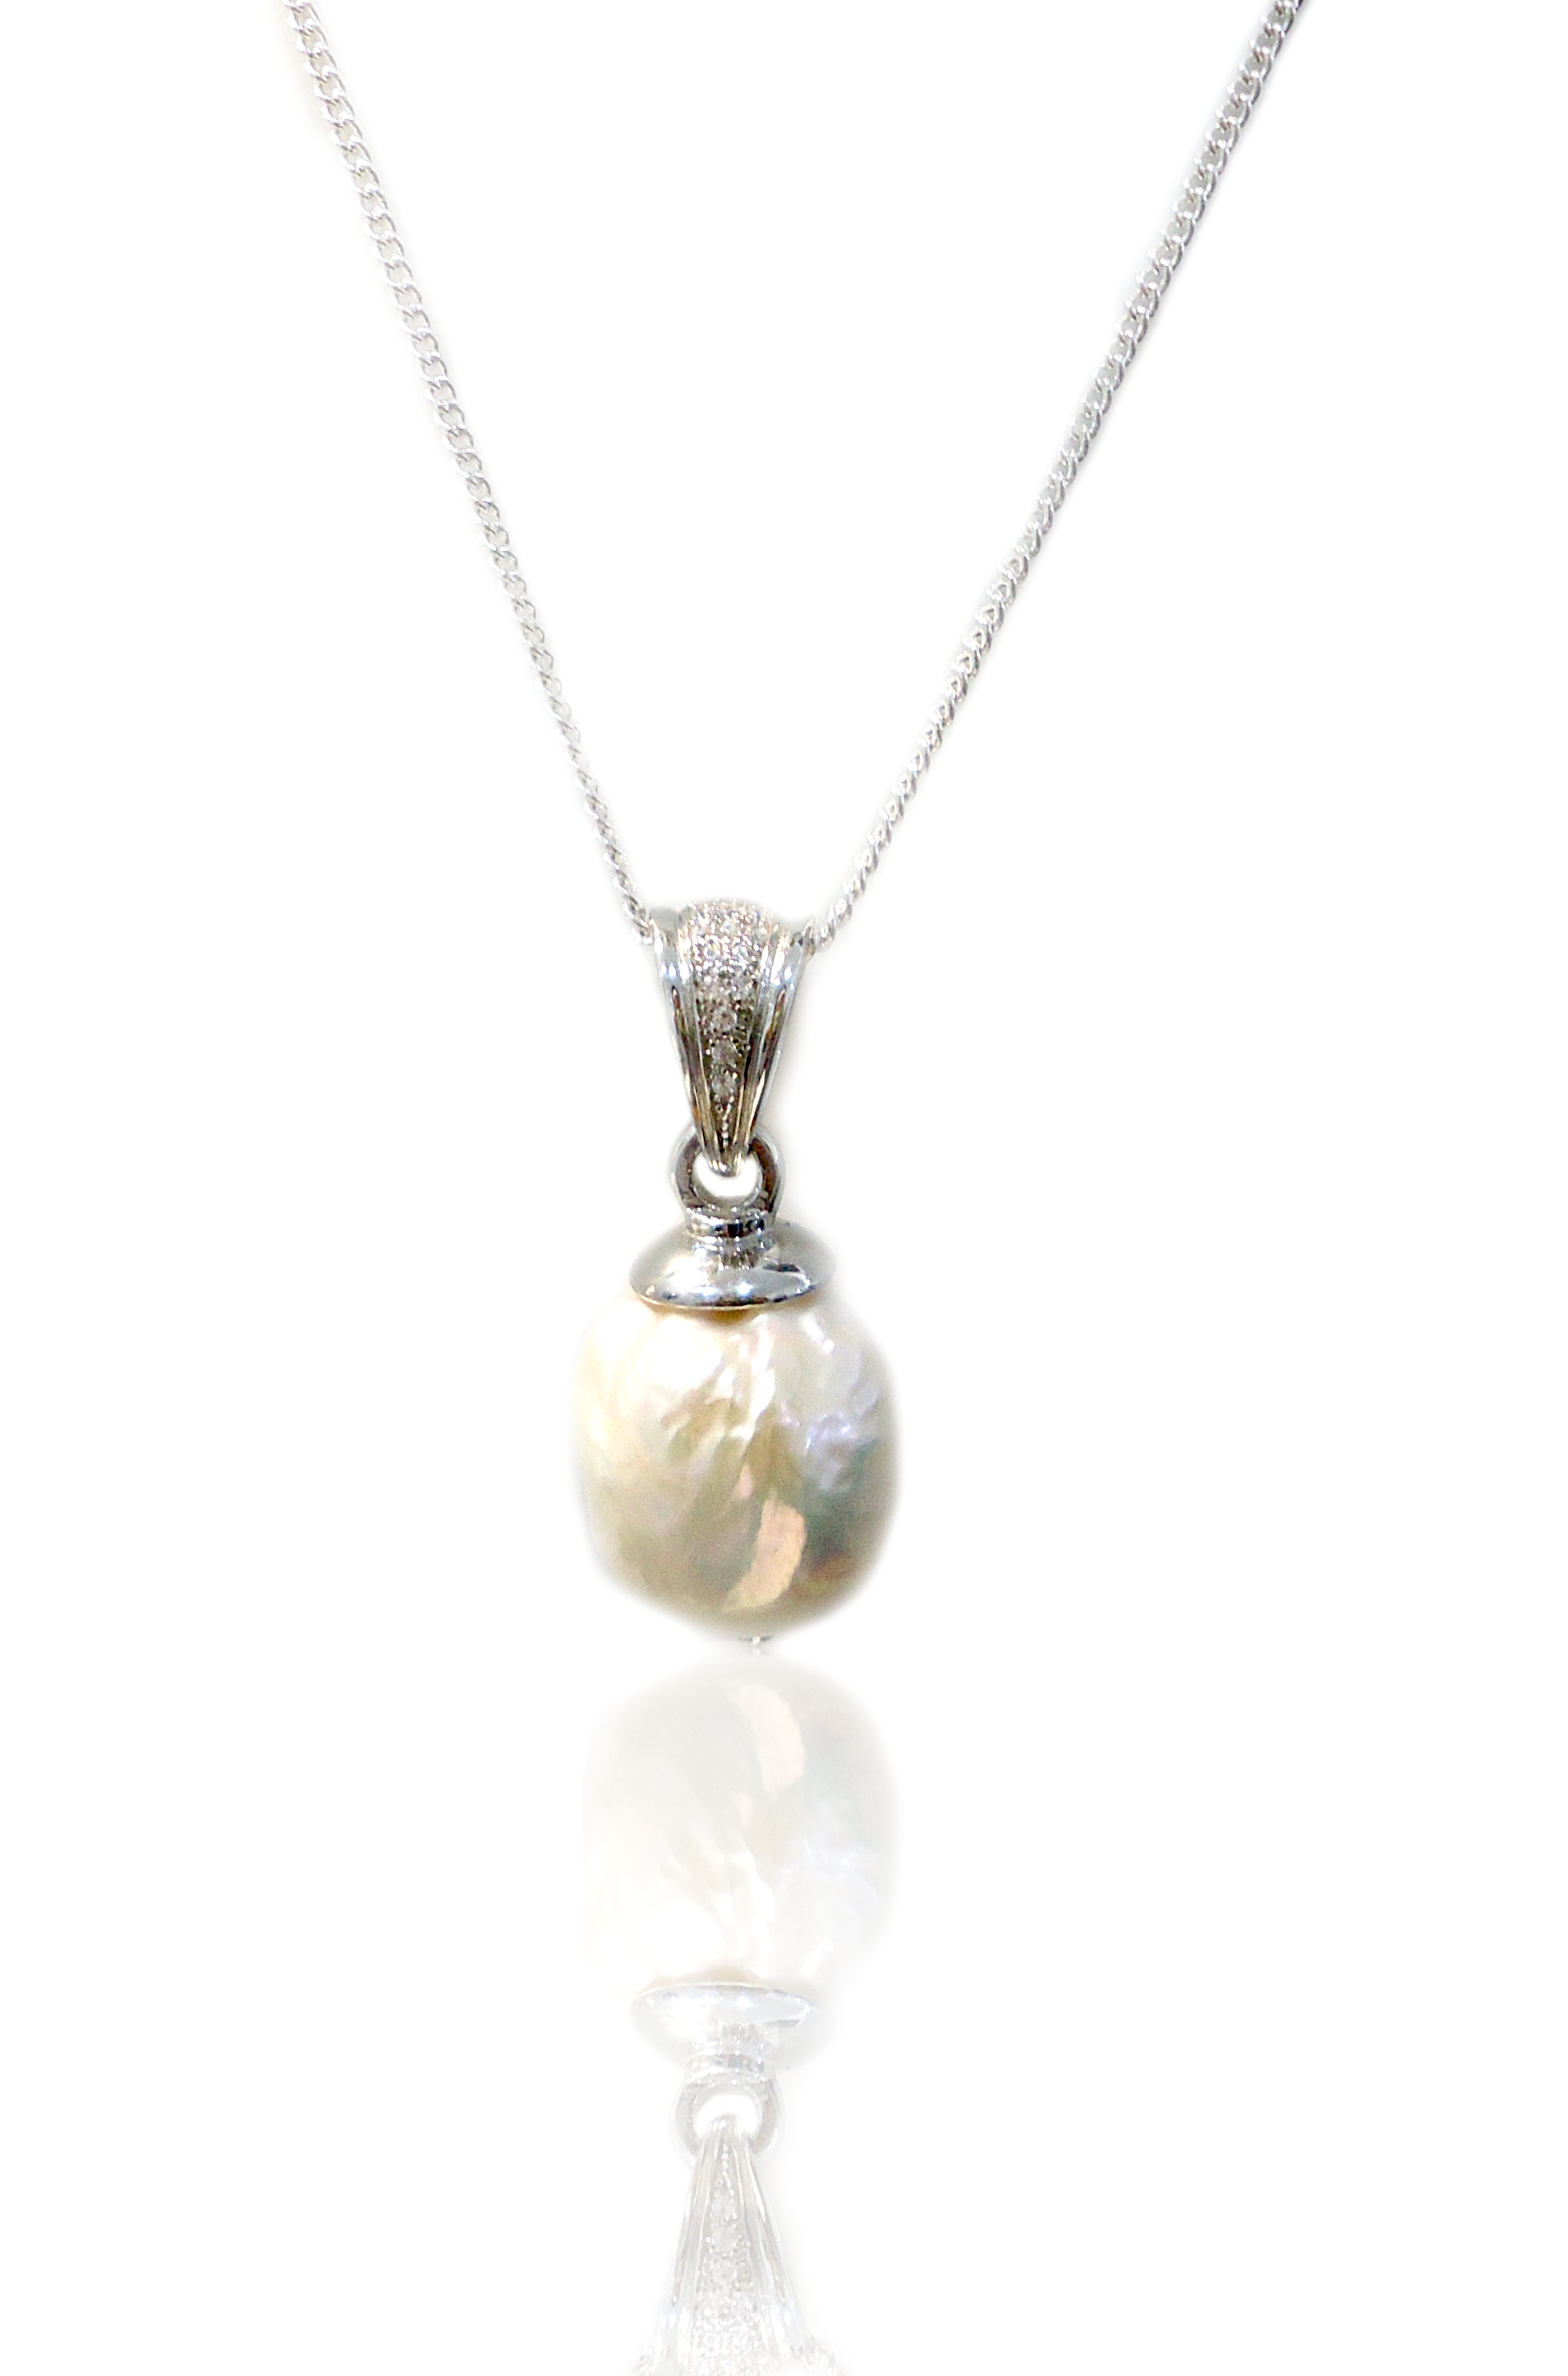 Elegant pearl & cubic zirconia necklace!